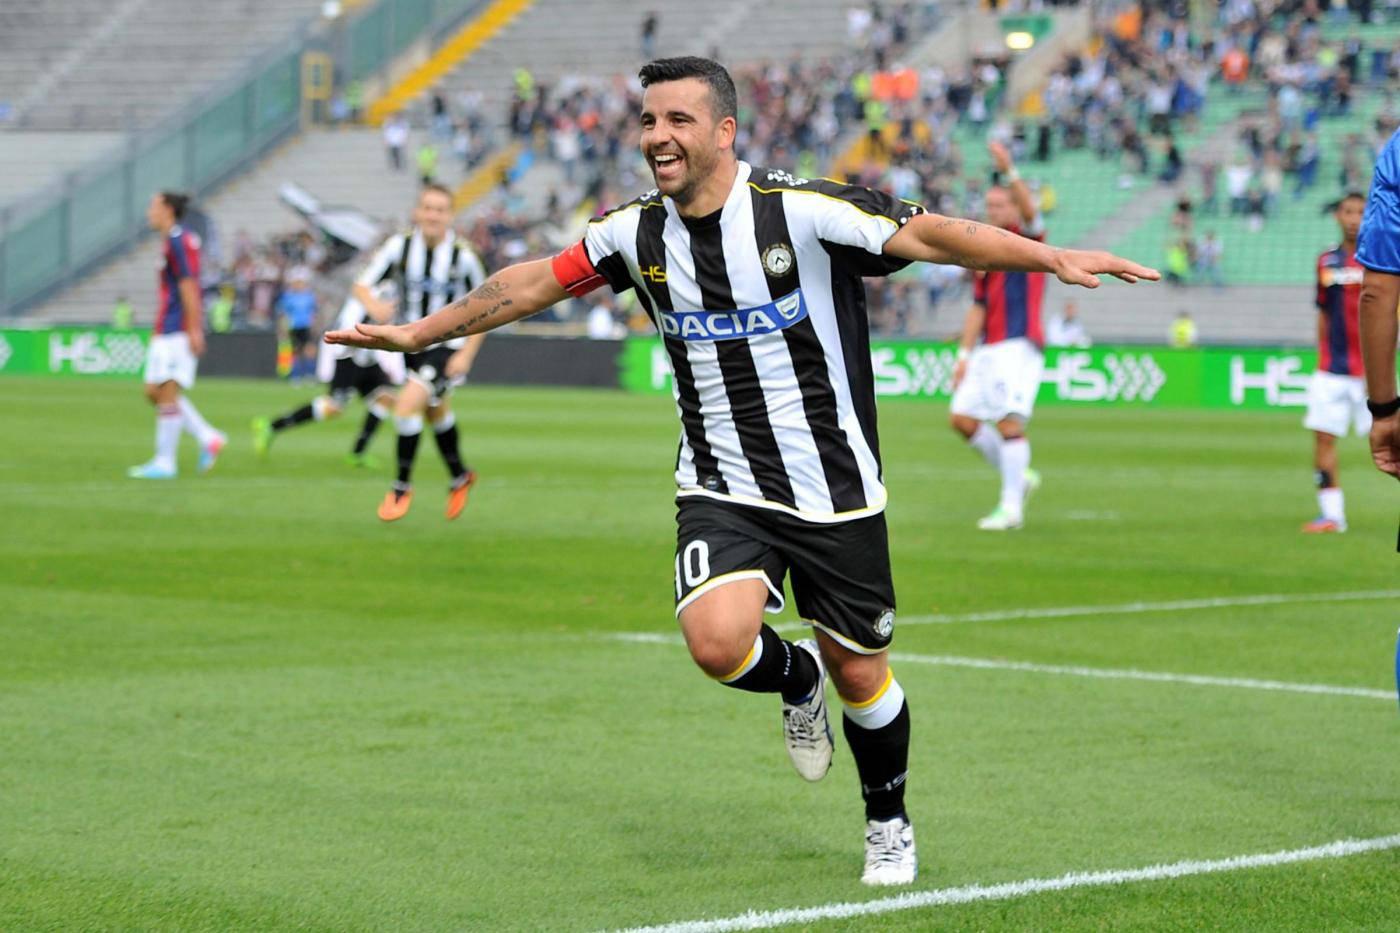 udinese genoa gol di natale death - photo#33